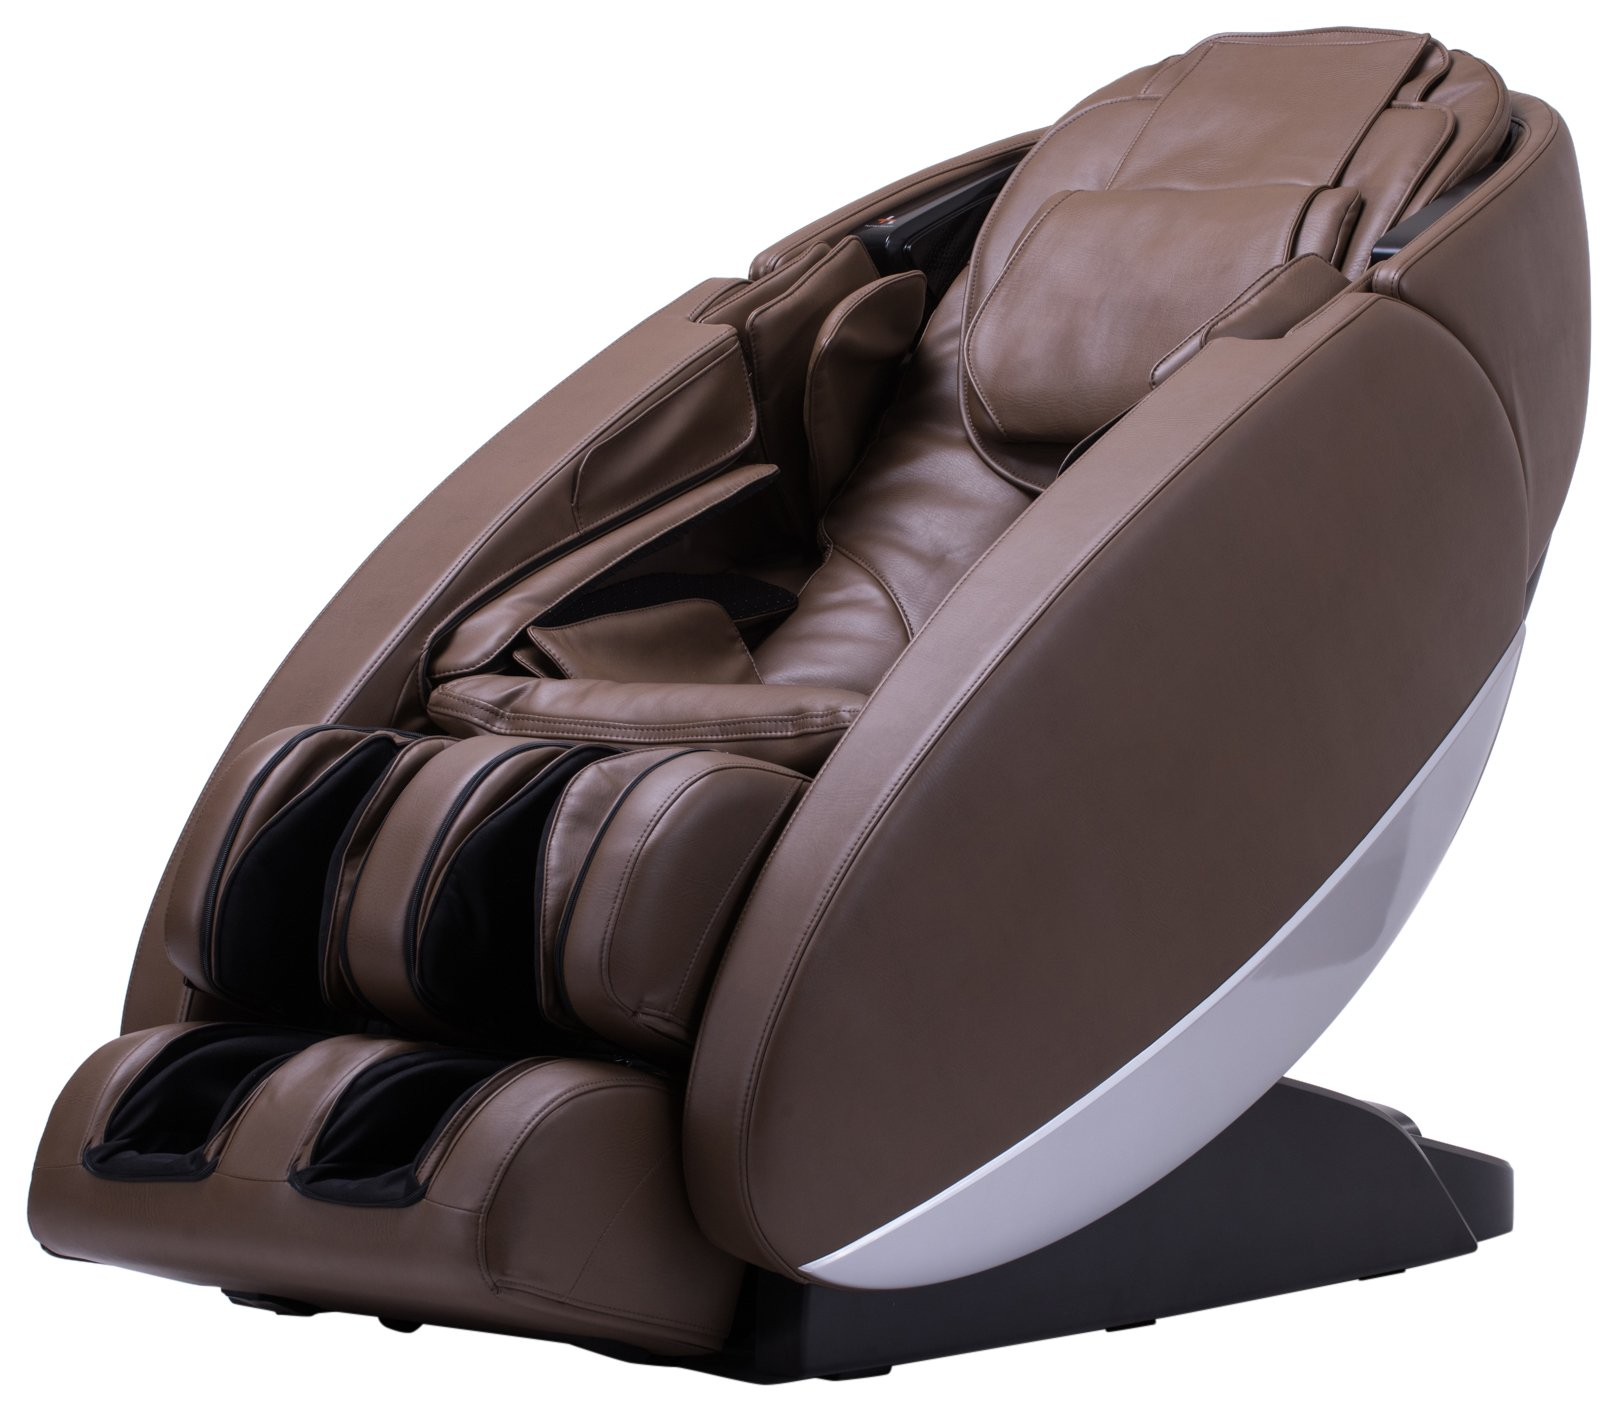 Human Touch ''Novo'' Full Body Coverage Zero-Gravity L-Track Massage Chair, Brown Color Option